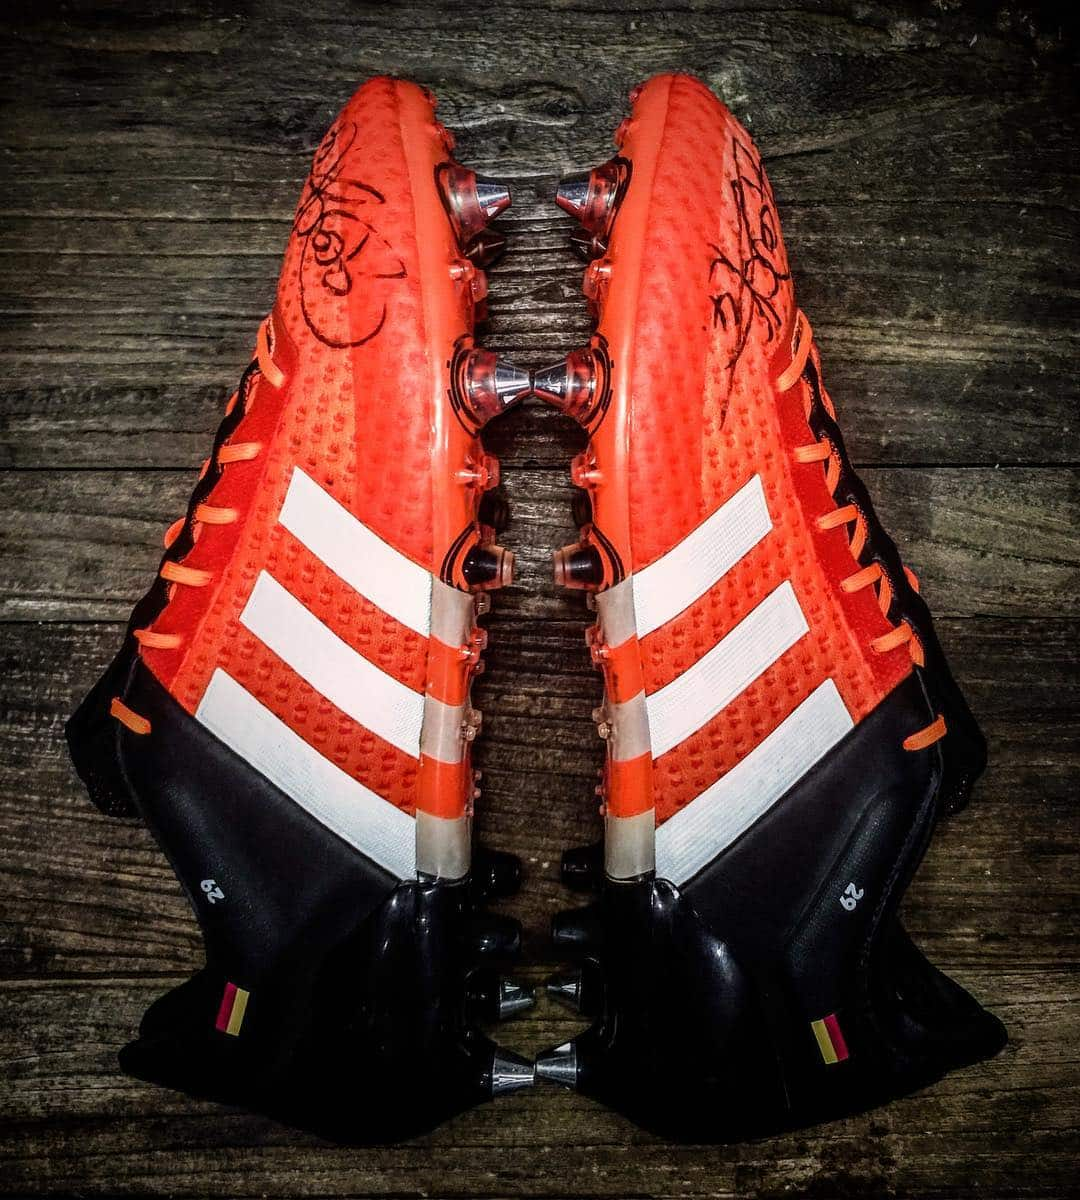 collection-chaussures-de-foot-joueurs-4